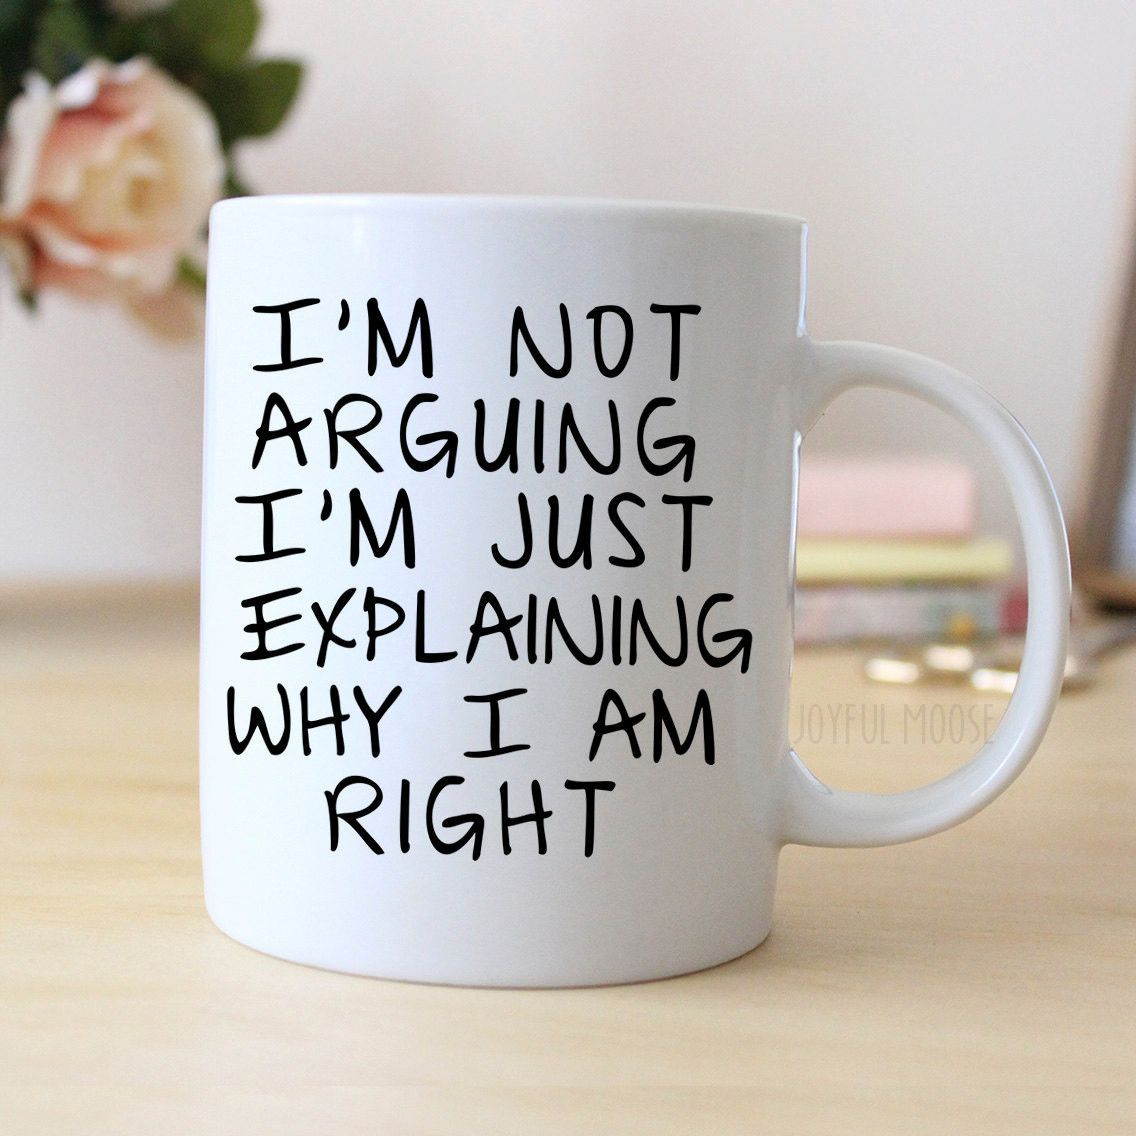 Coffee Mugs With Funny Sayings Birthday Gift For Men Funny Coffee Mugs Mugs Coffee Humor